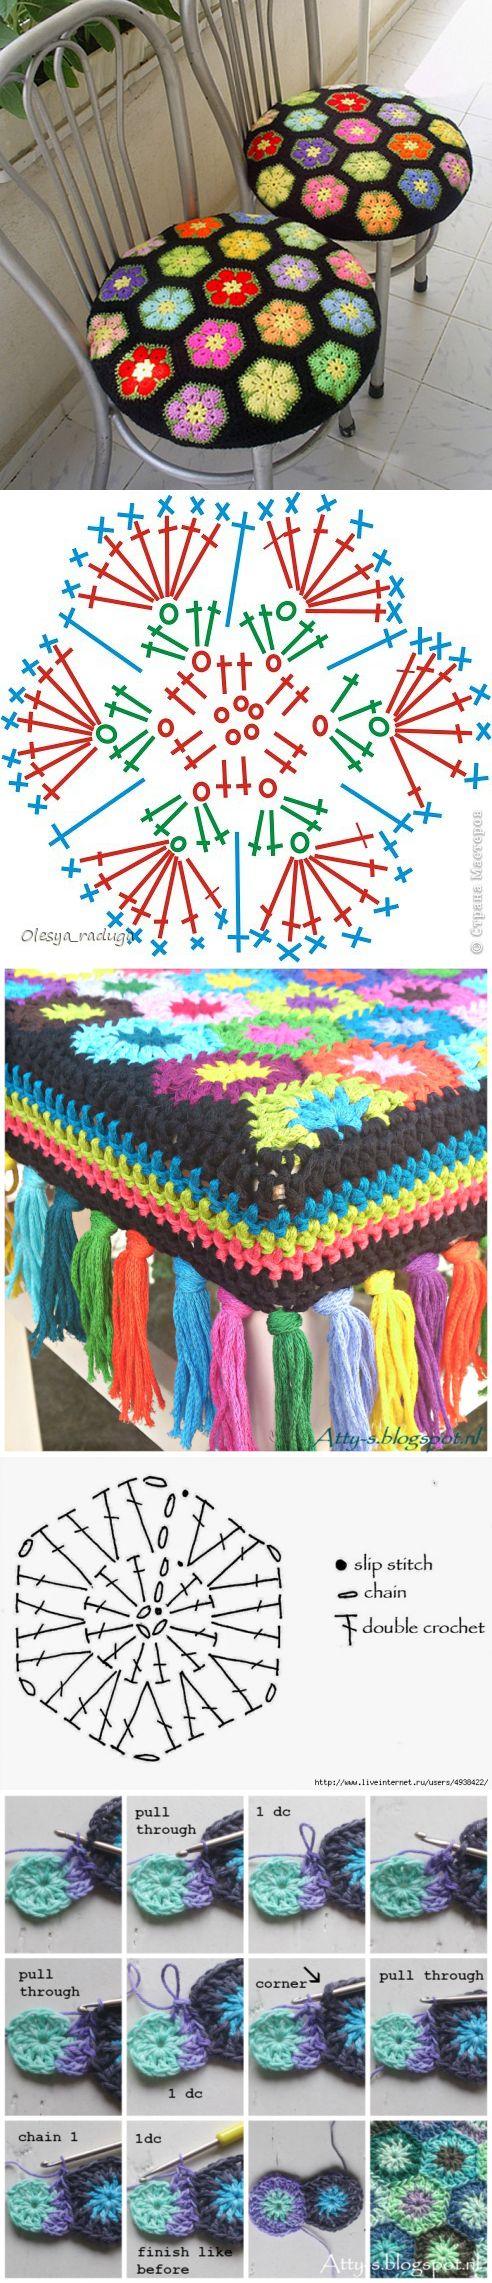 cojin crochet-esquema-patron-otakulandia.es (10)